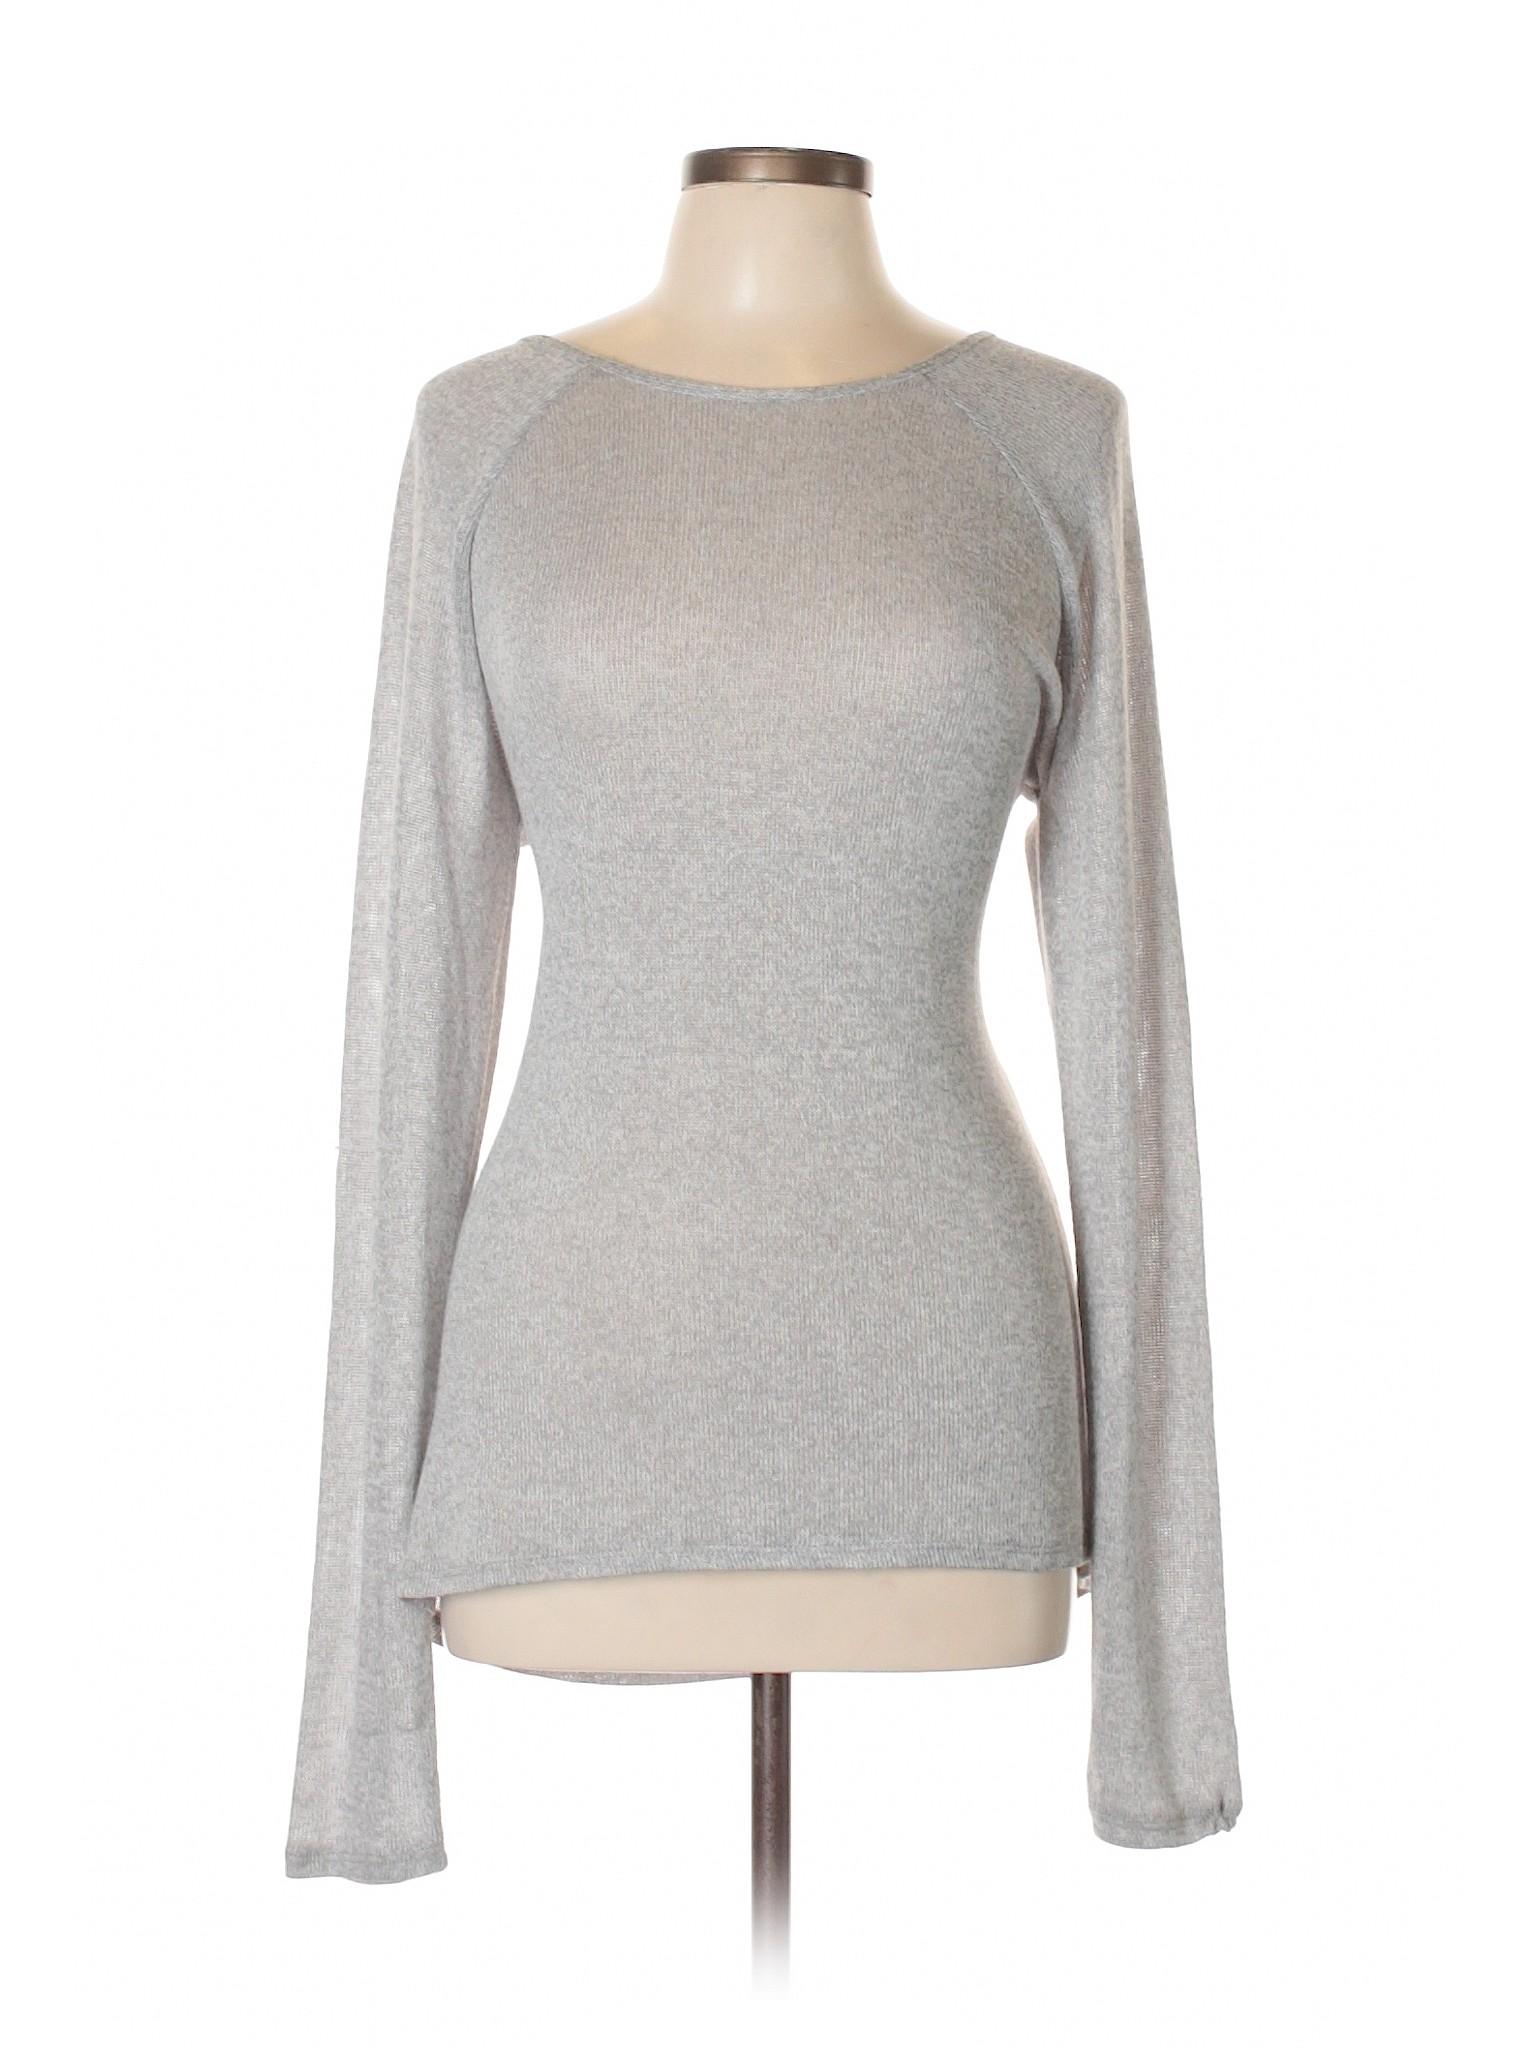 Sweater Ideology Boutique Pullover Boutique Ideology fqZpHZ